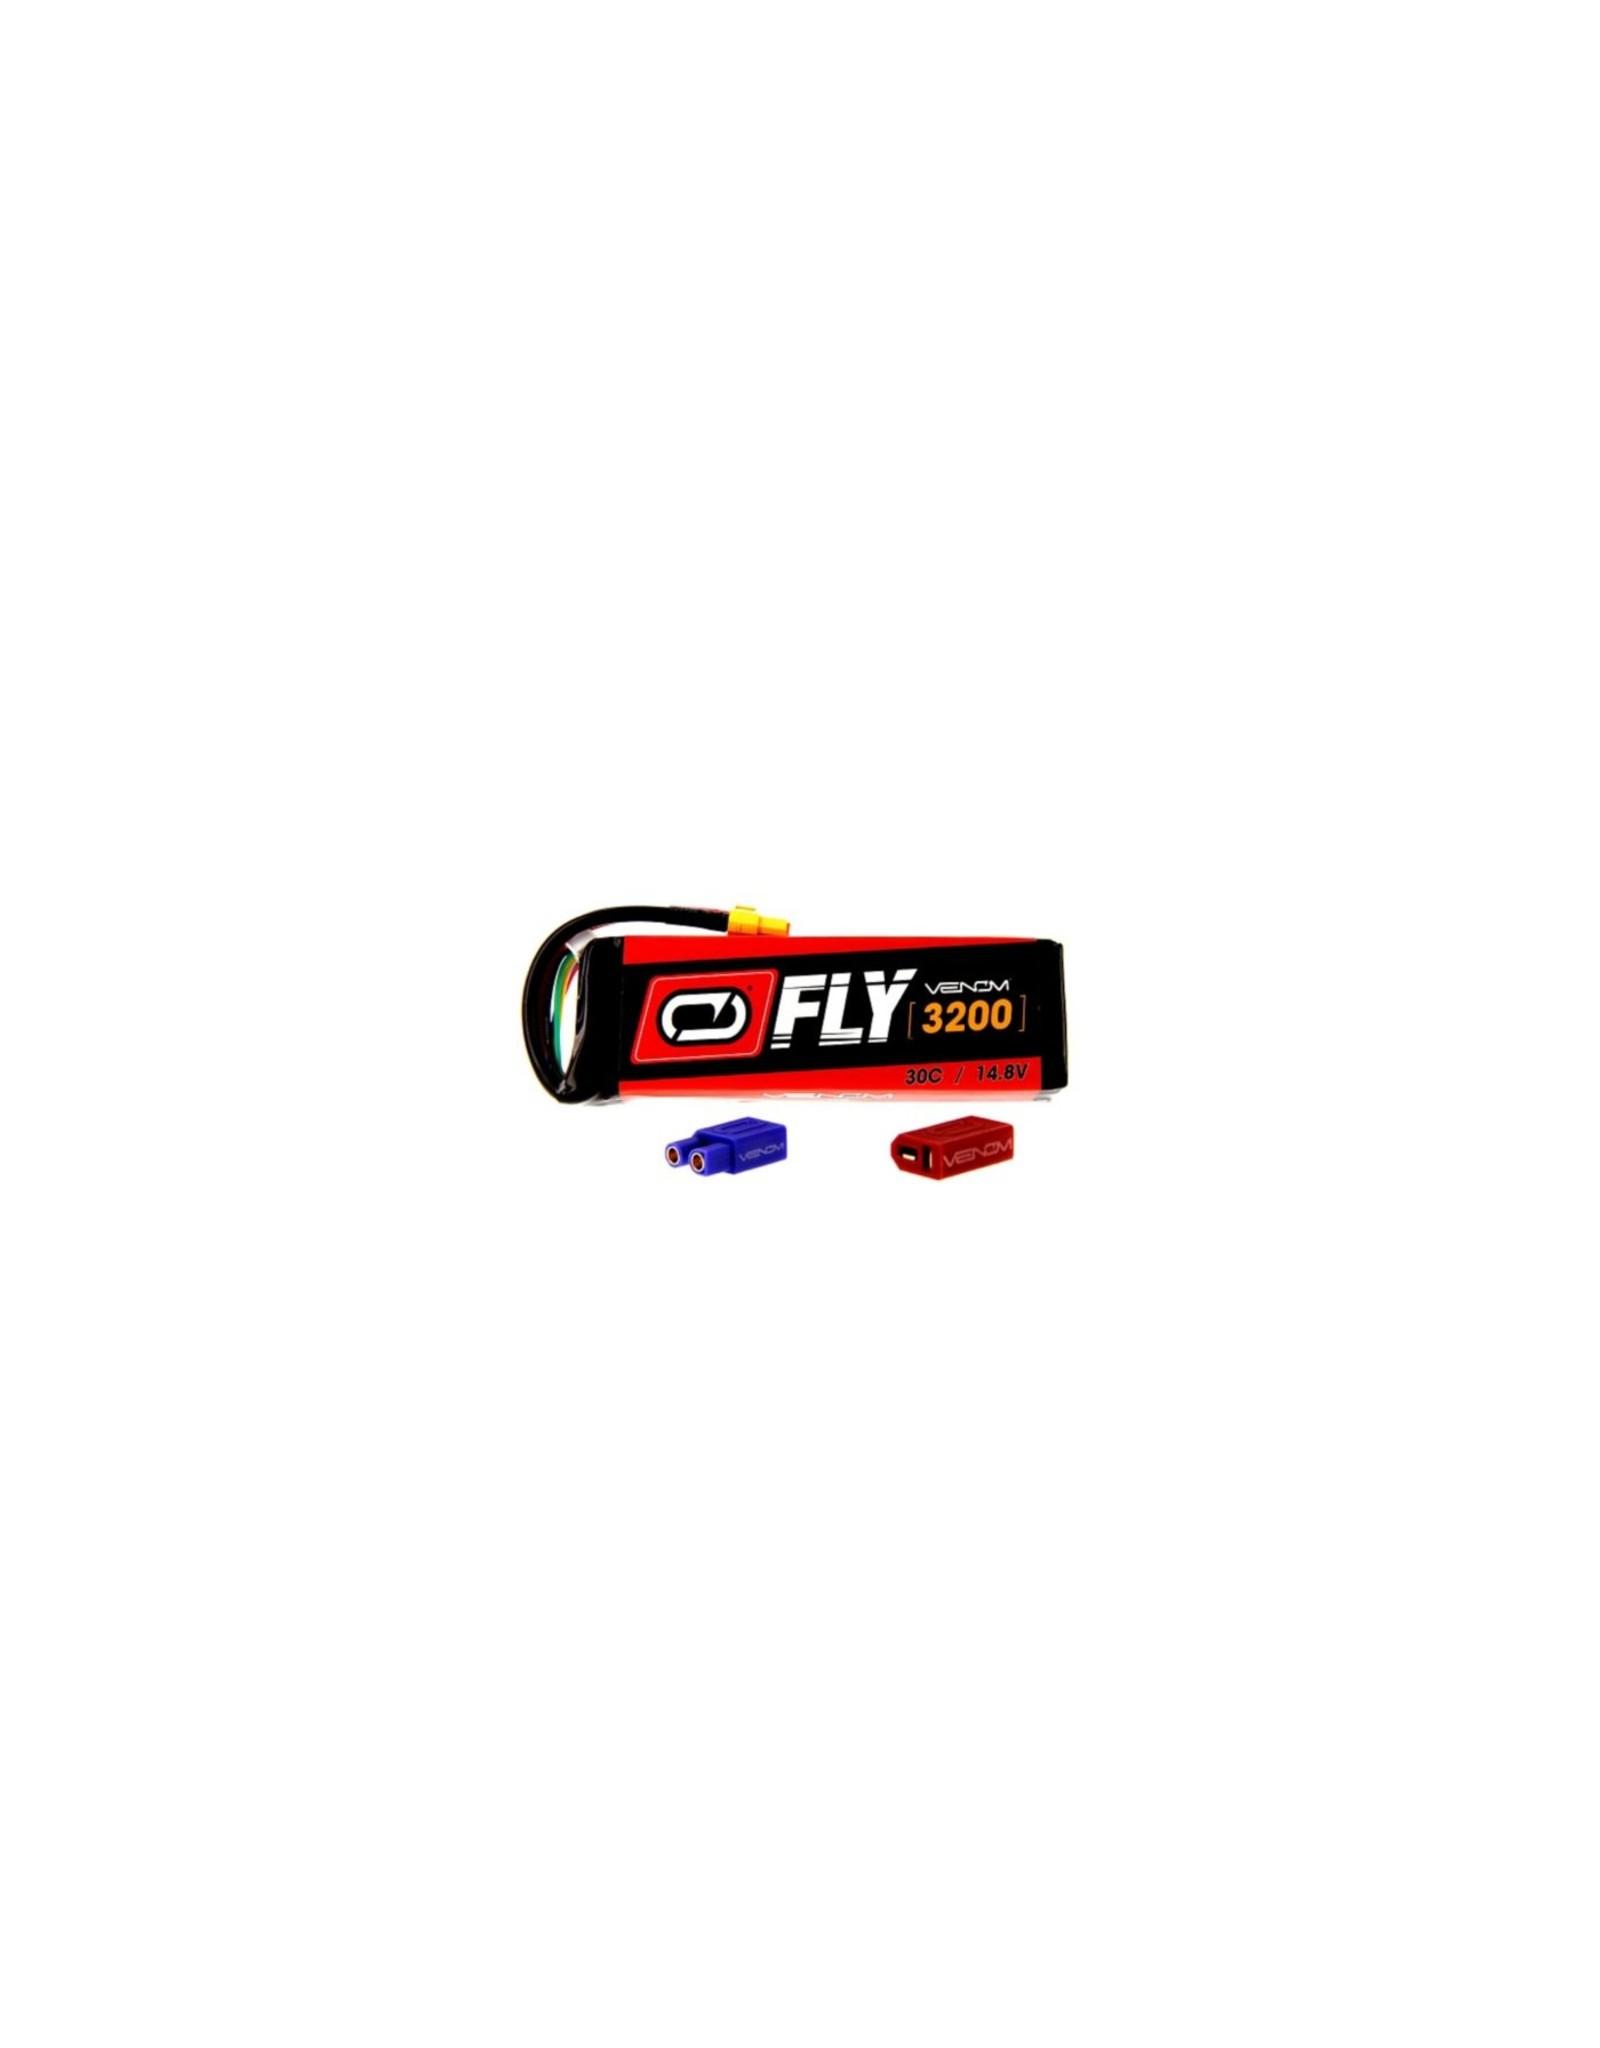 Venom Racing VNR25013 - 14.8V 3200mAh 4S 30C FLY LiPo Battery: UNI 2.0 Plug